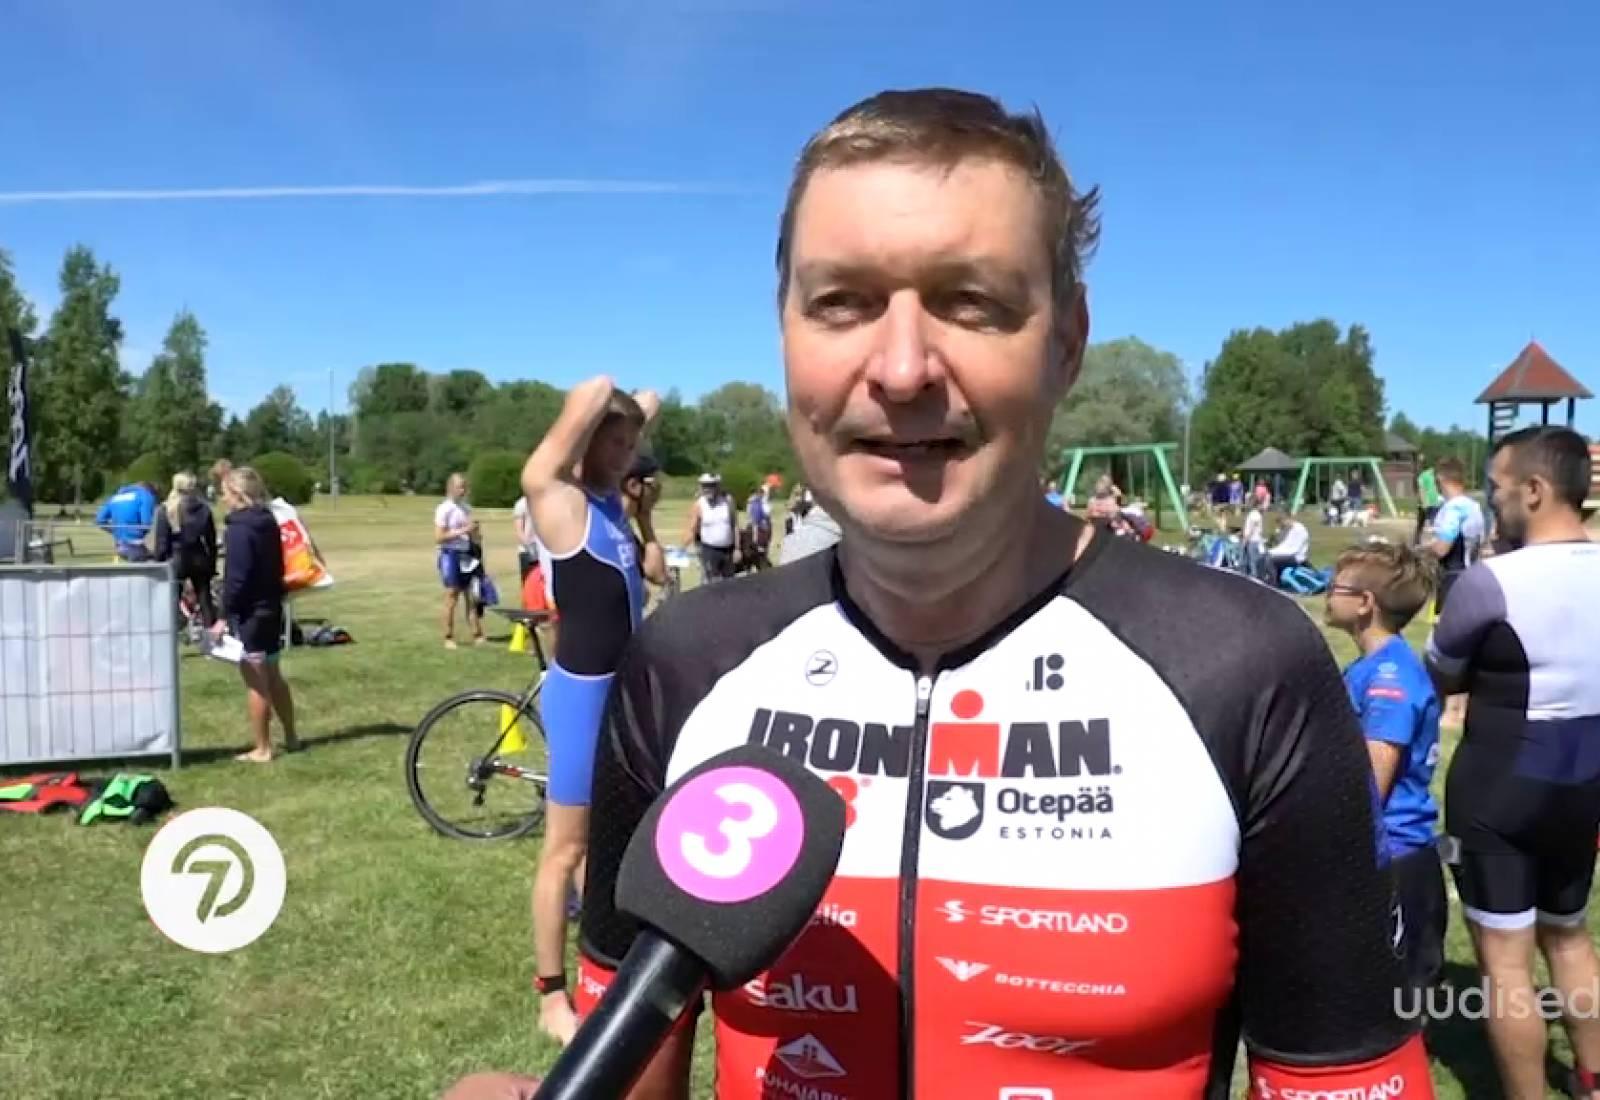 VIDEO! Paides avati triatlonisuvi